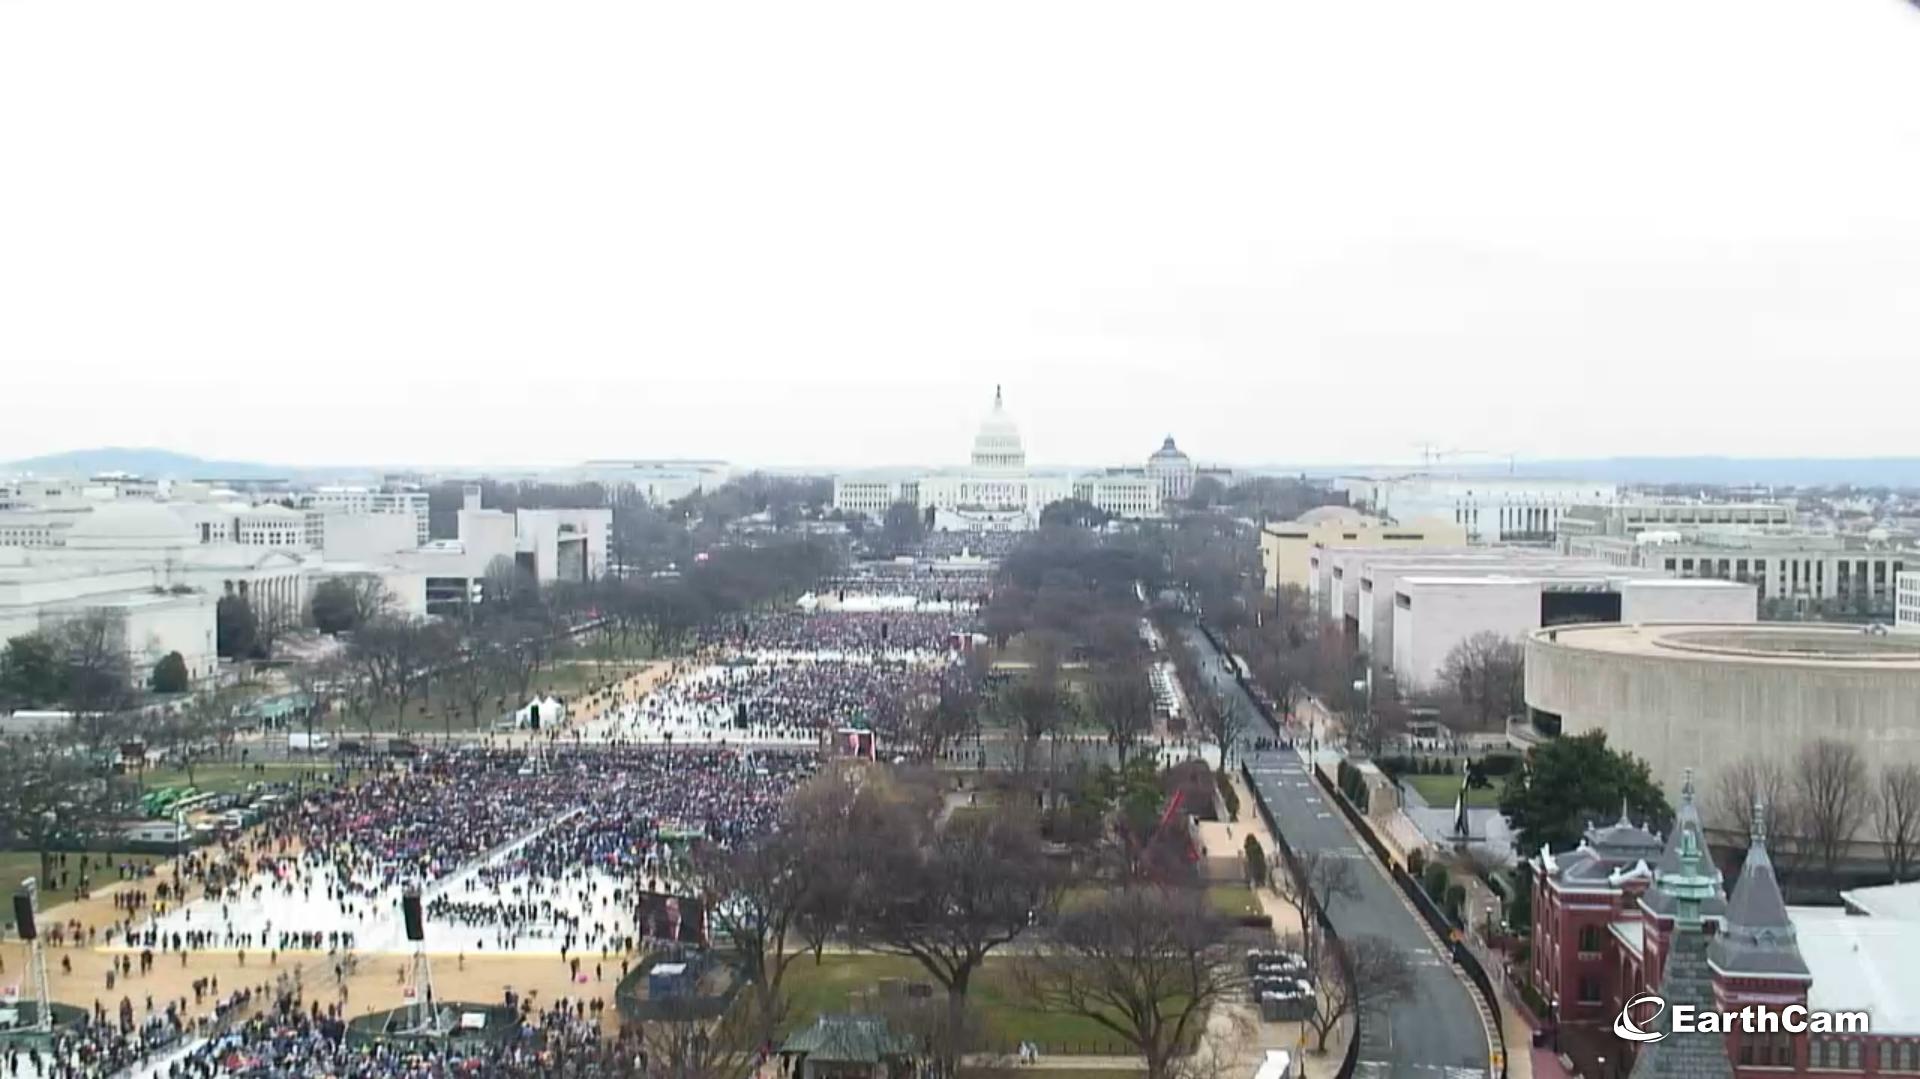 inauguration-crowd.jpg